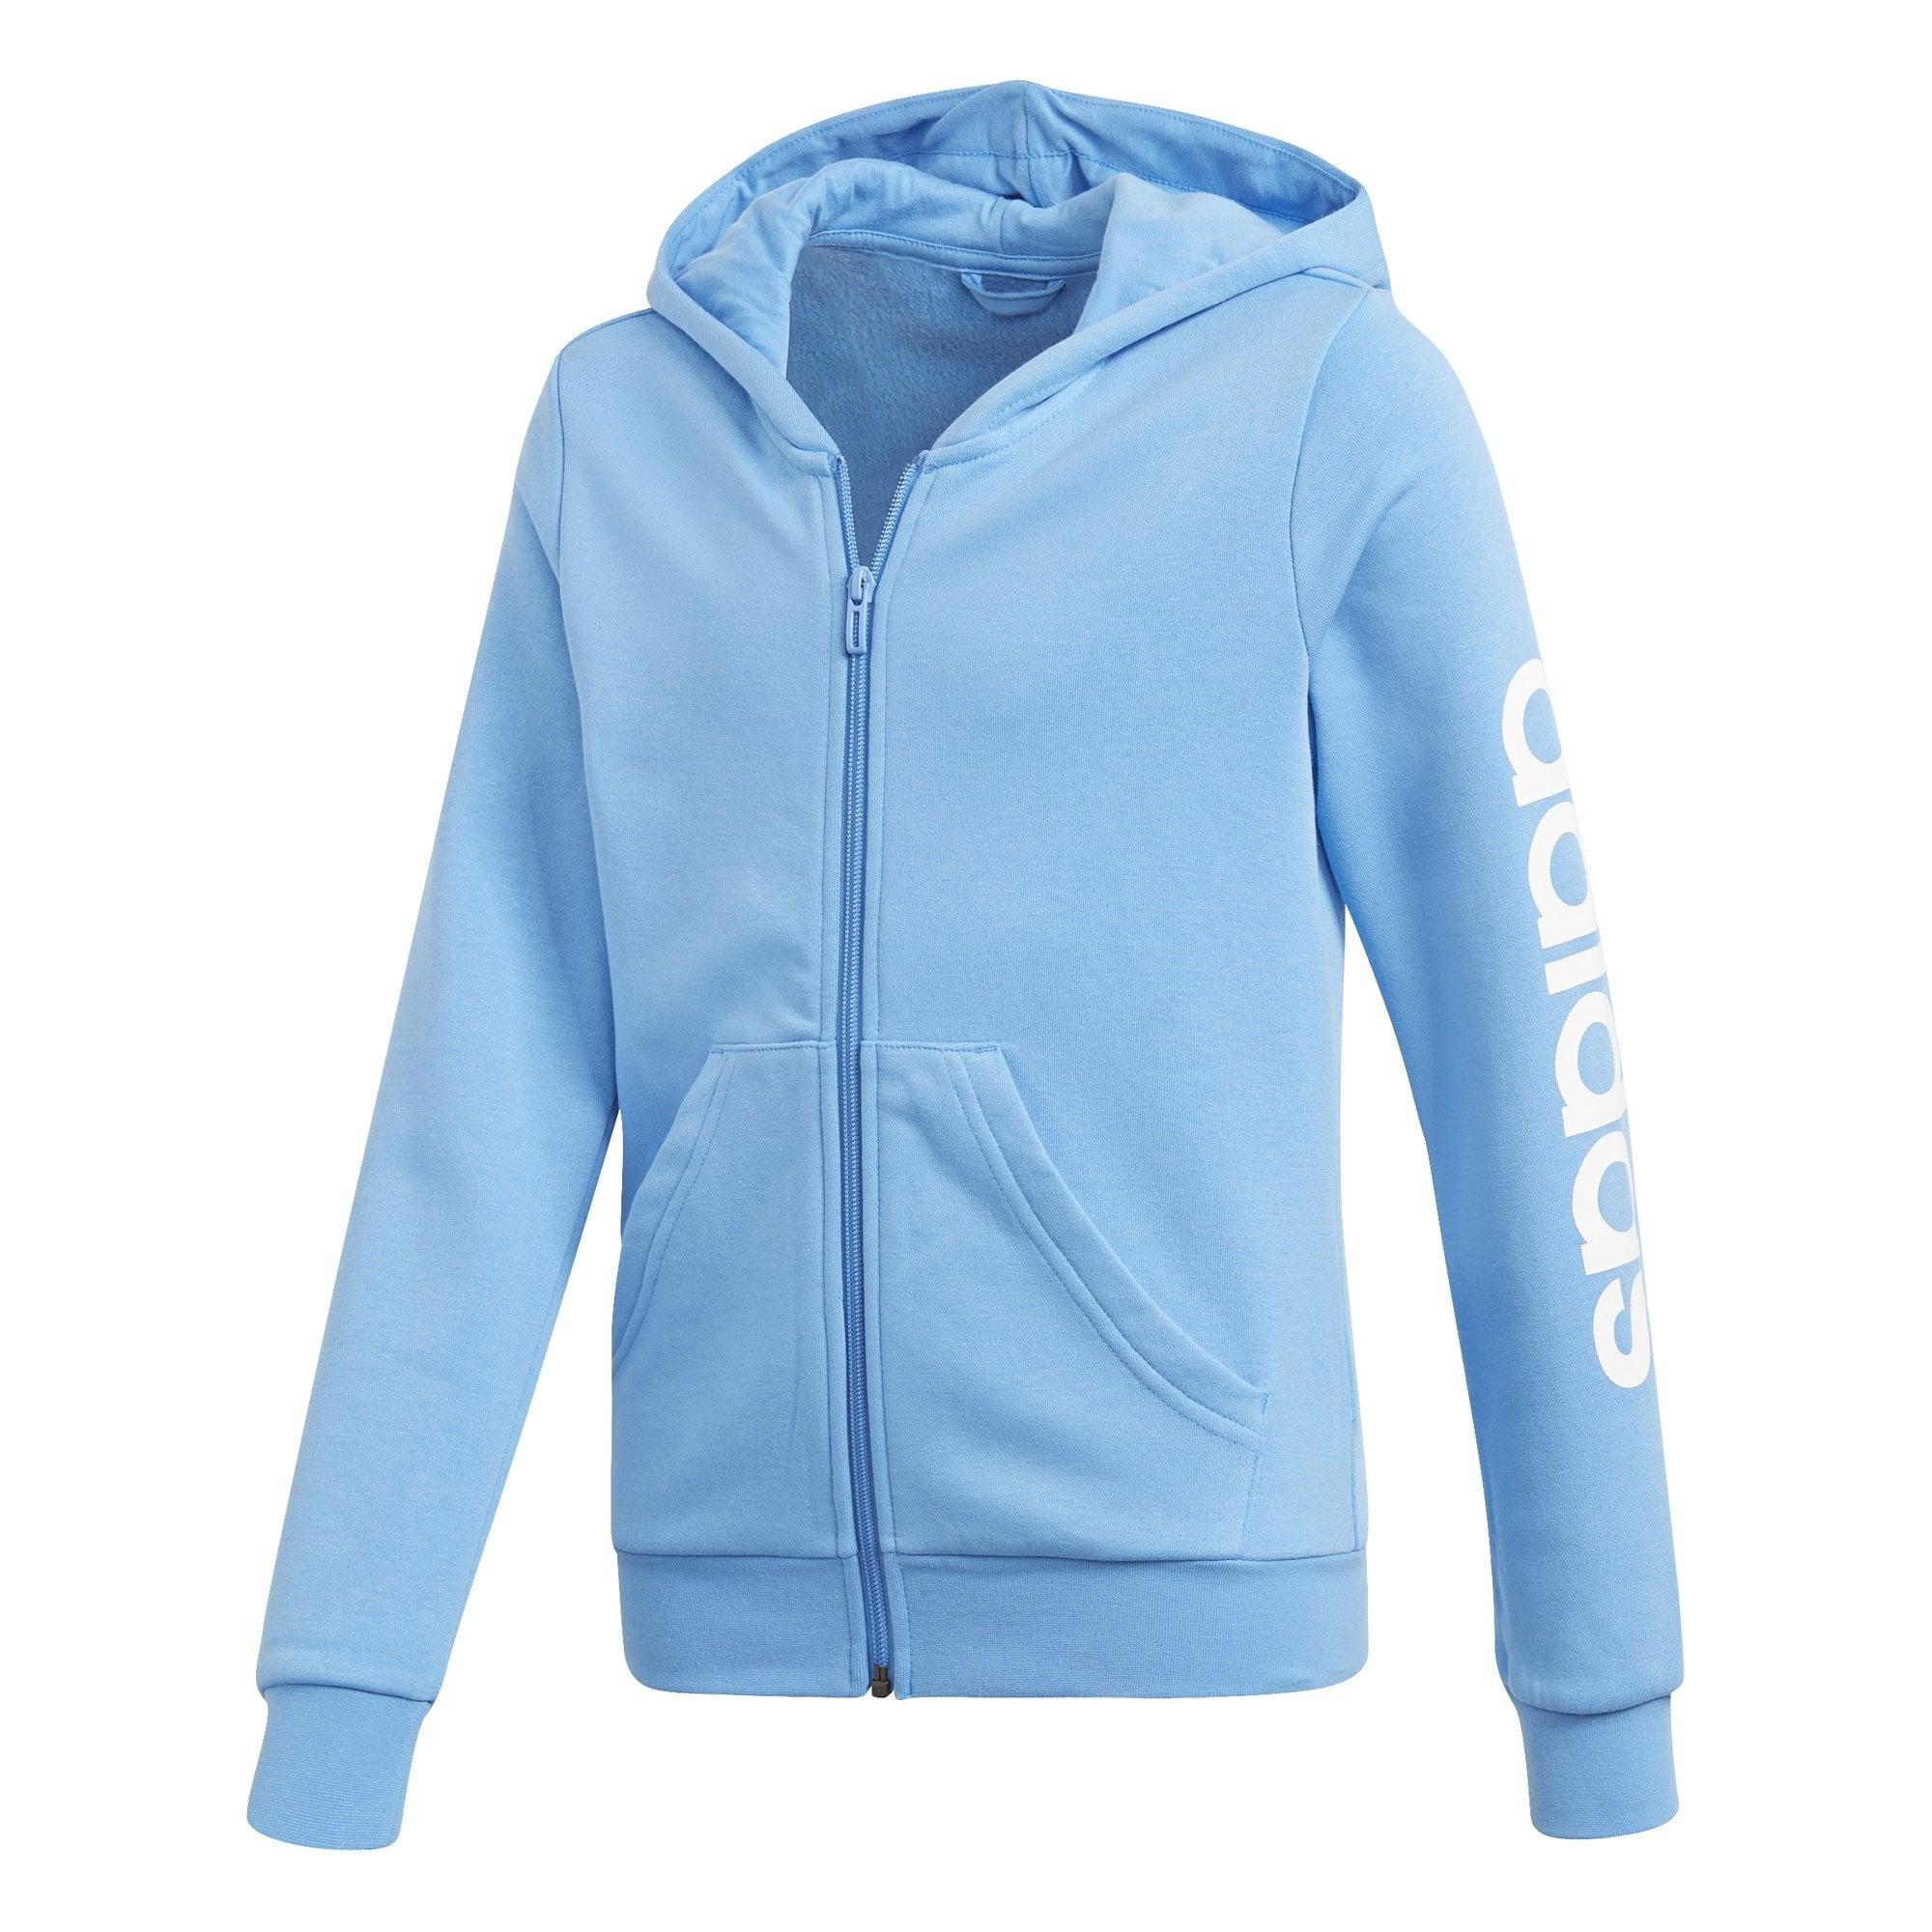 Adidas Girls Essentials Linear Full Zip Blue